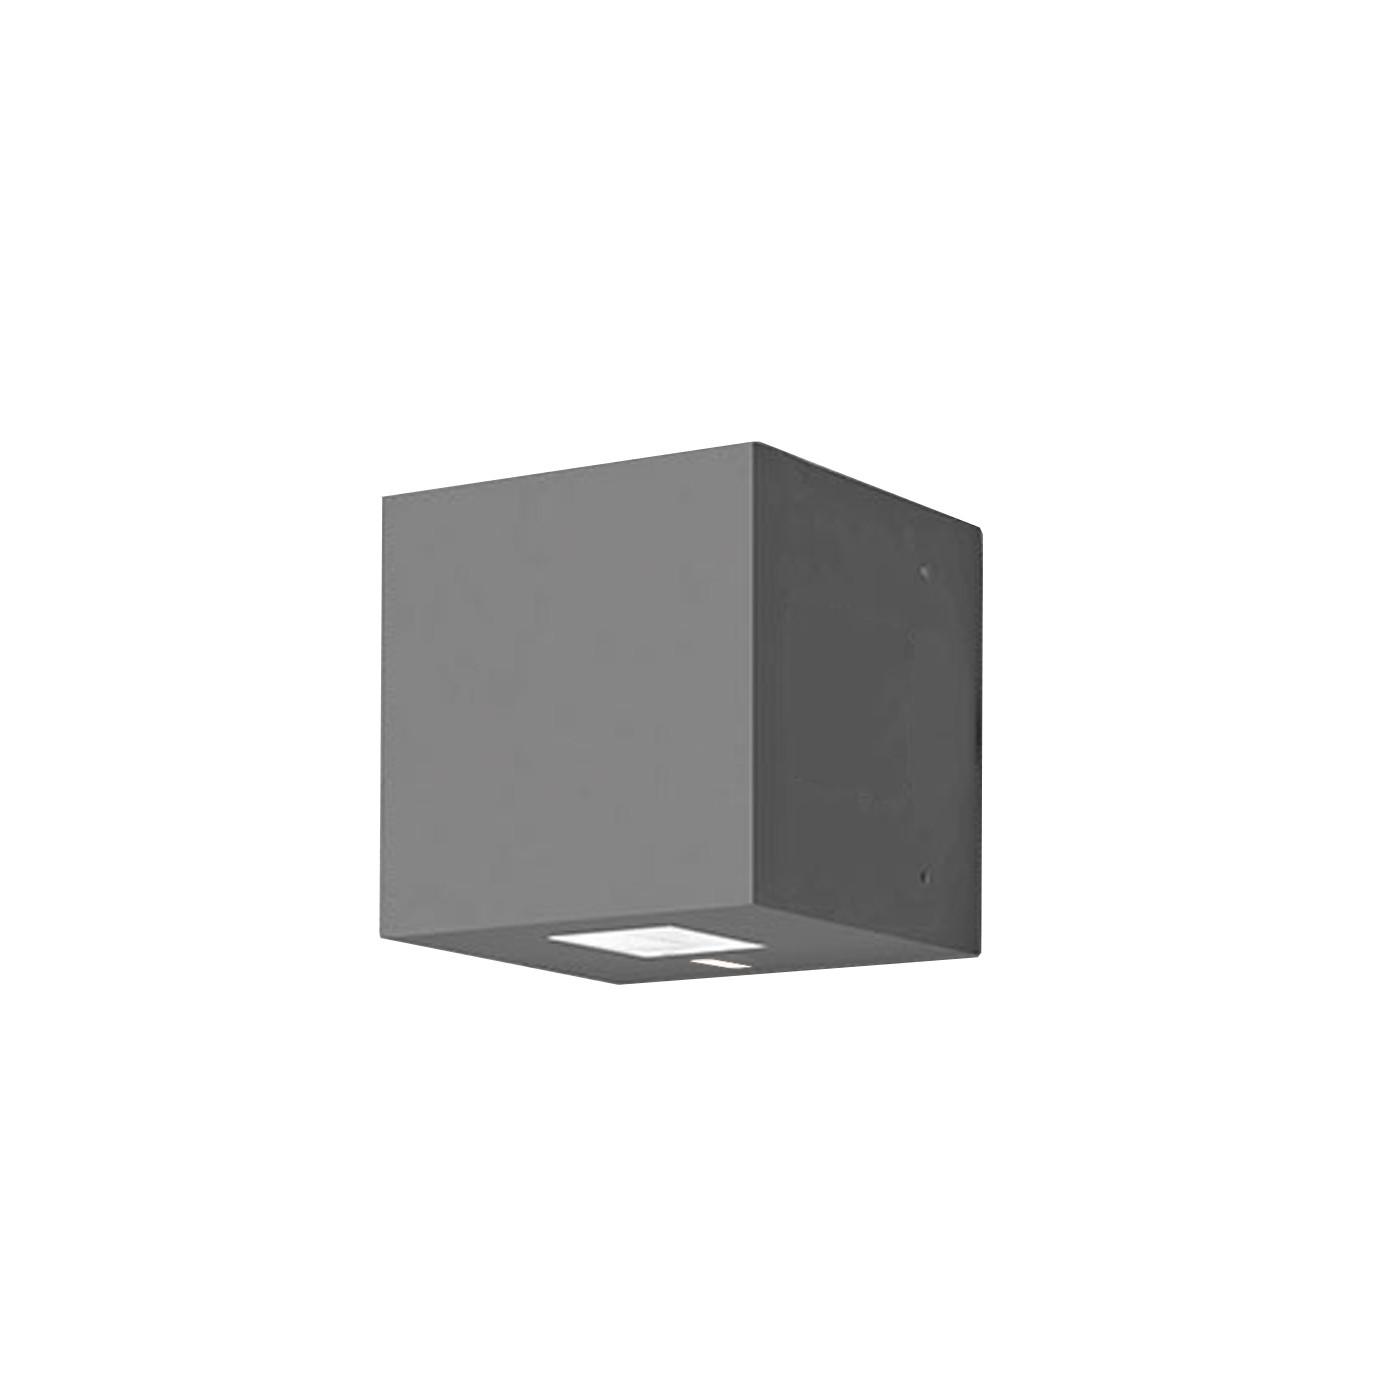 Artemide Effetto 14 Square 1 Large Beam + 1 Narrow Beam